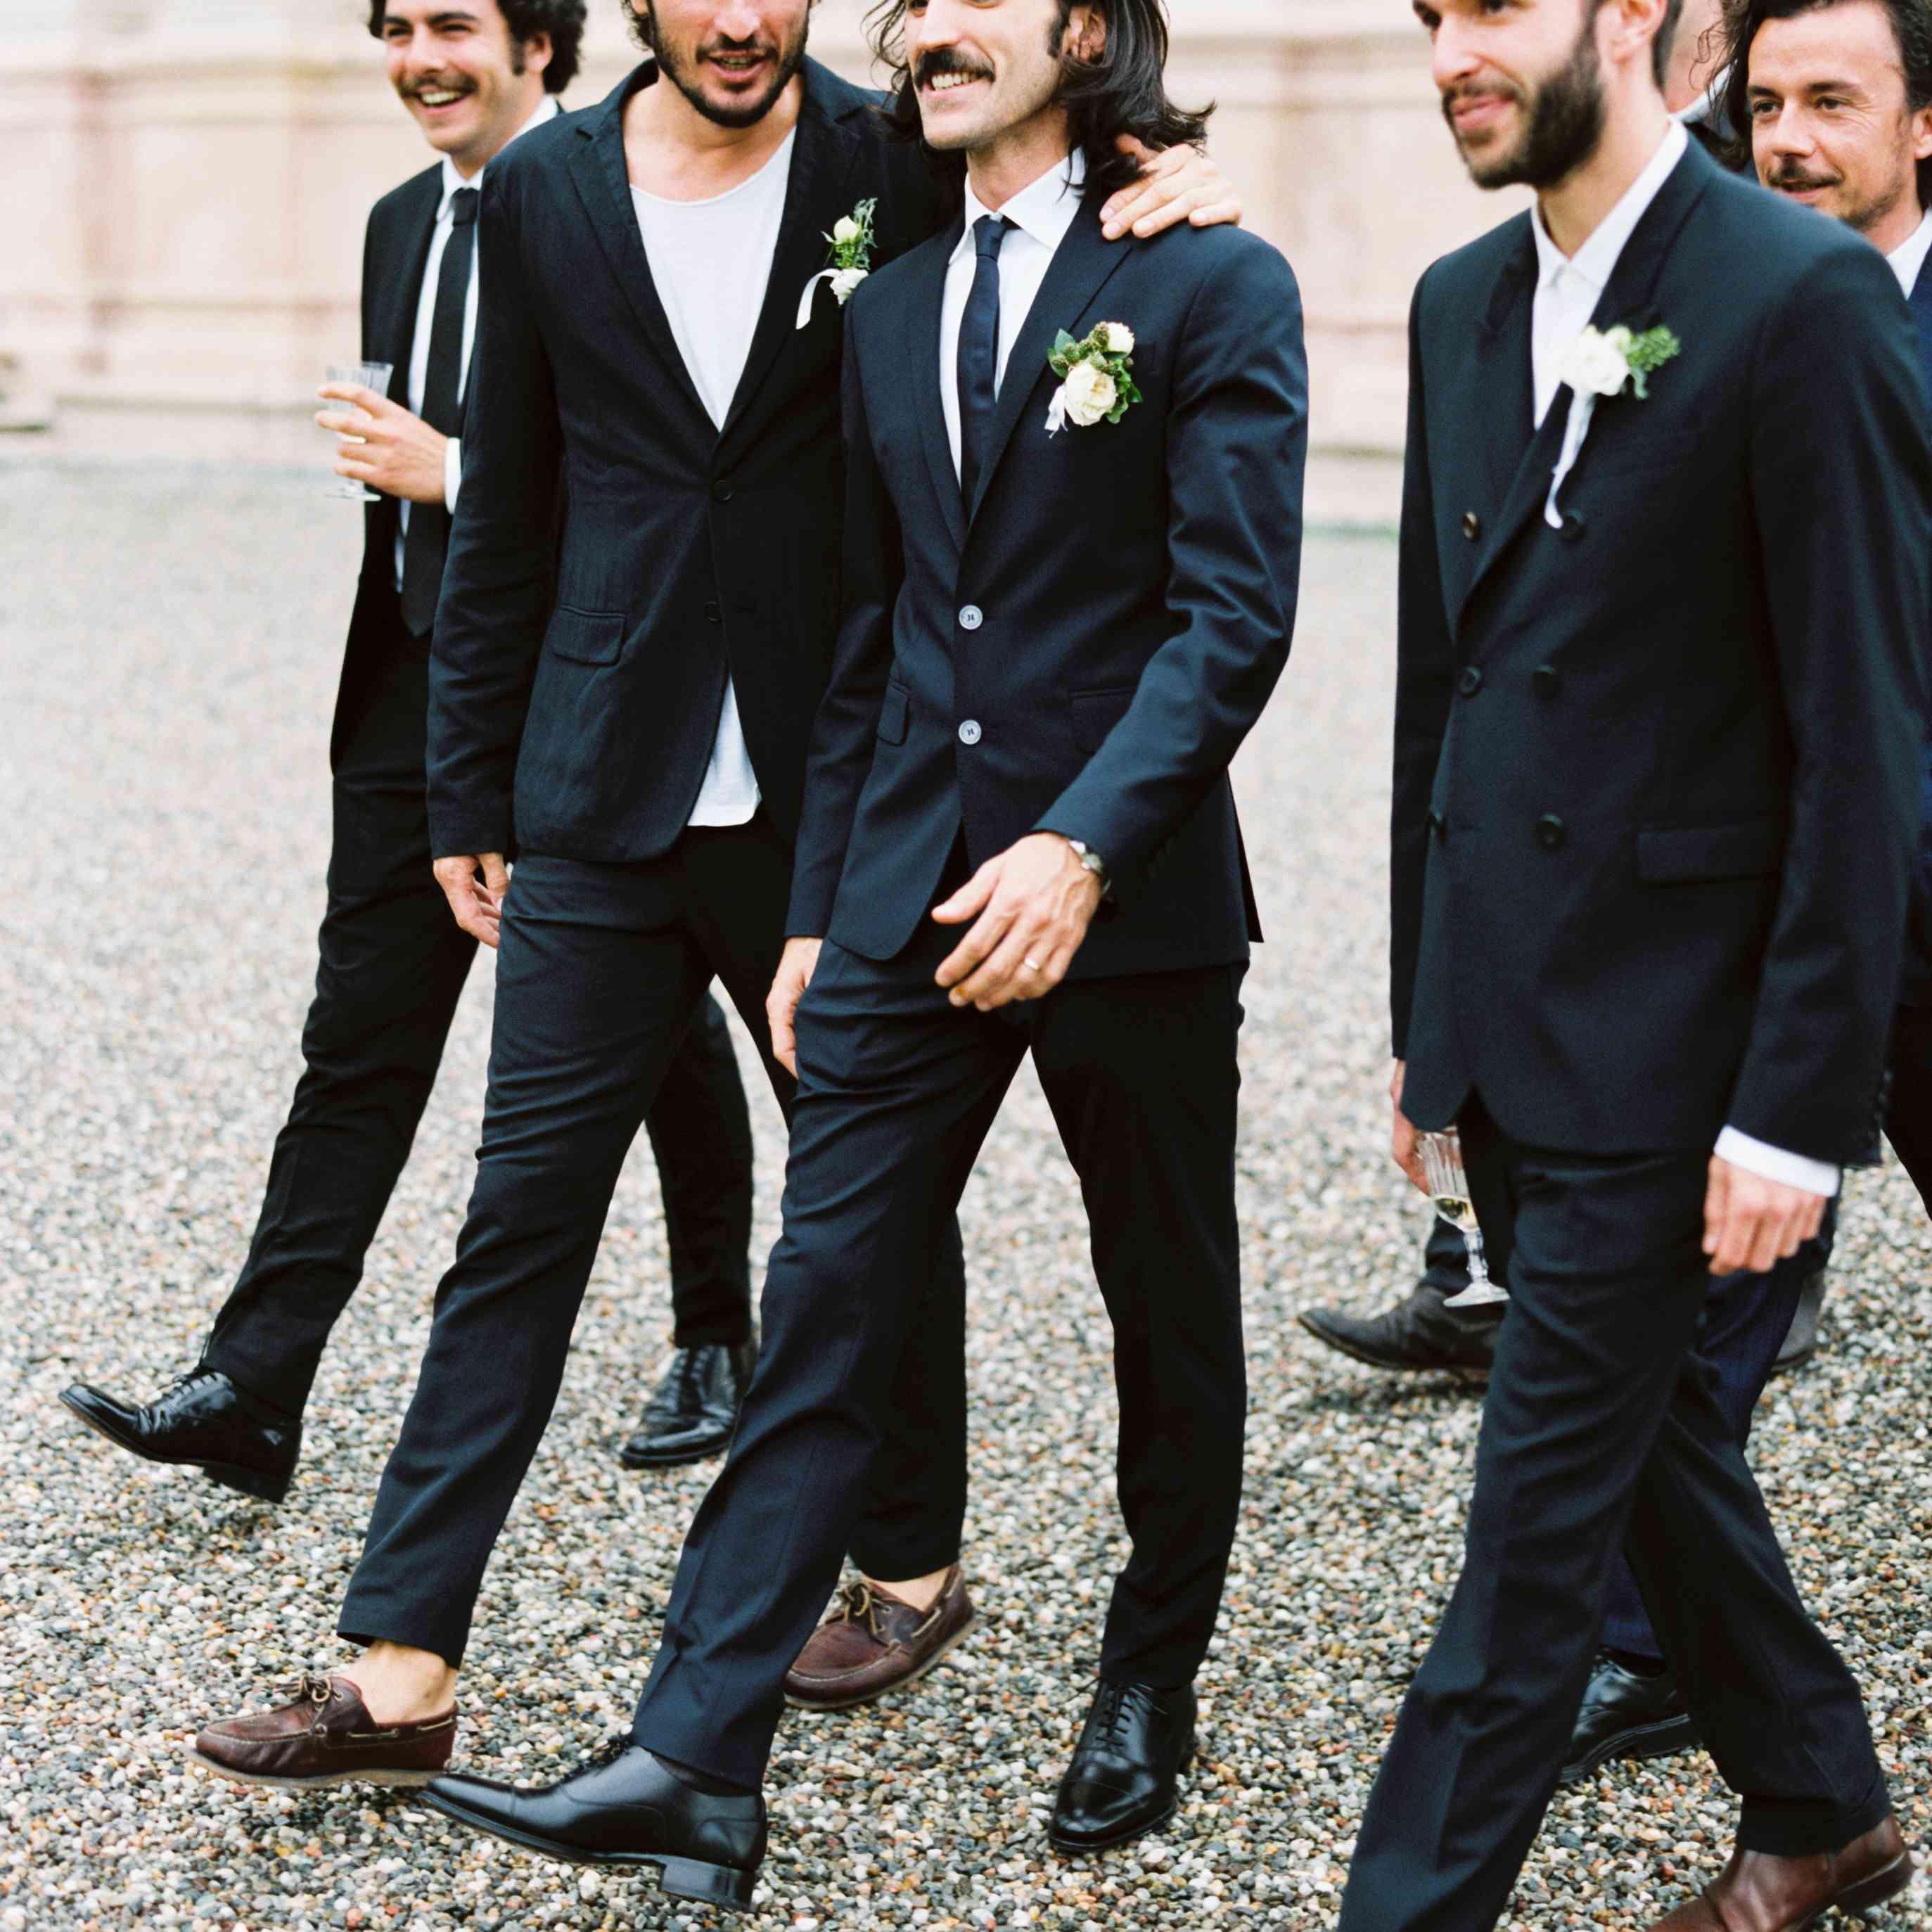 Northern Italian Wedding, Groomsmen